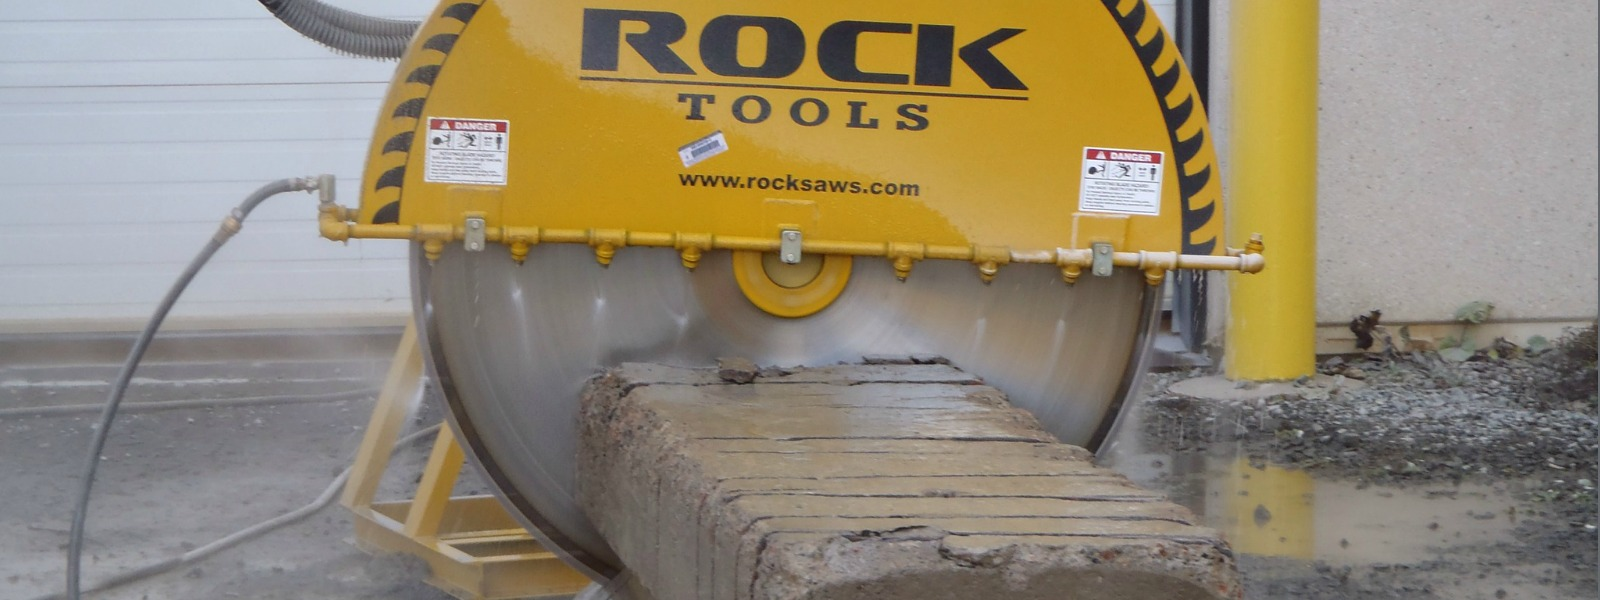 Concrete saw cutting concrete blocks